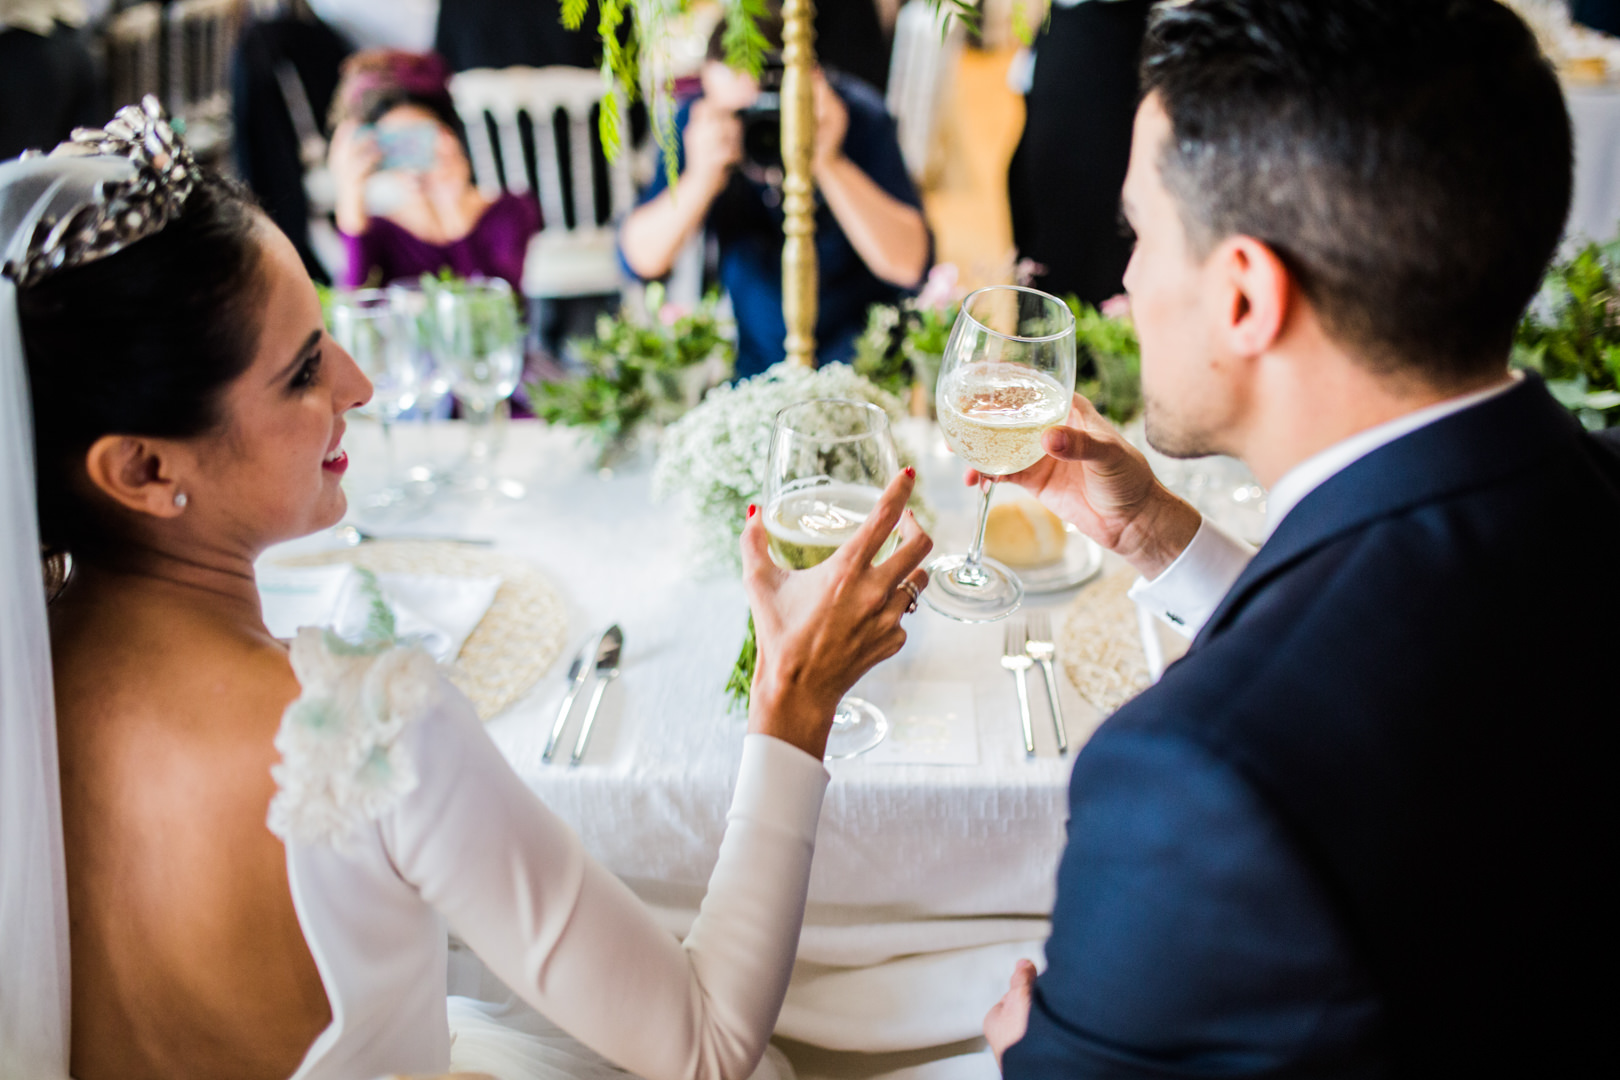 Boda-sevilla-Wedding-engagement-Rafael-Torres-fotografo-bodas-sevilla-madrid-barcelona-wedding-photographer--58.jpg